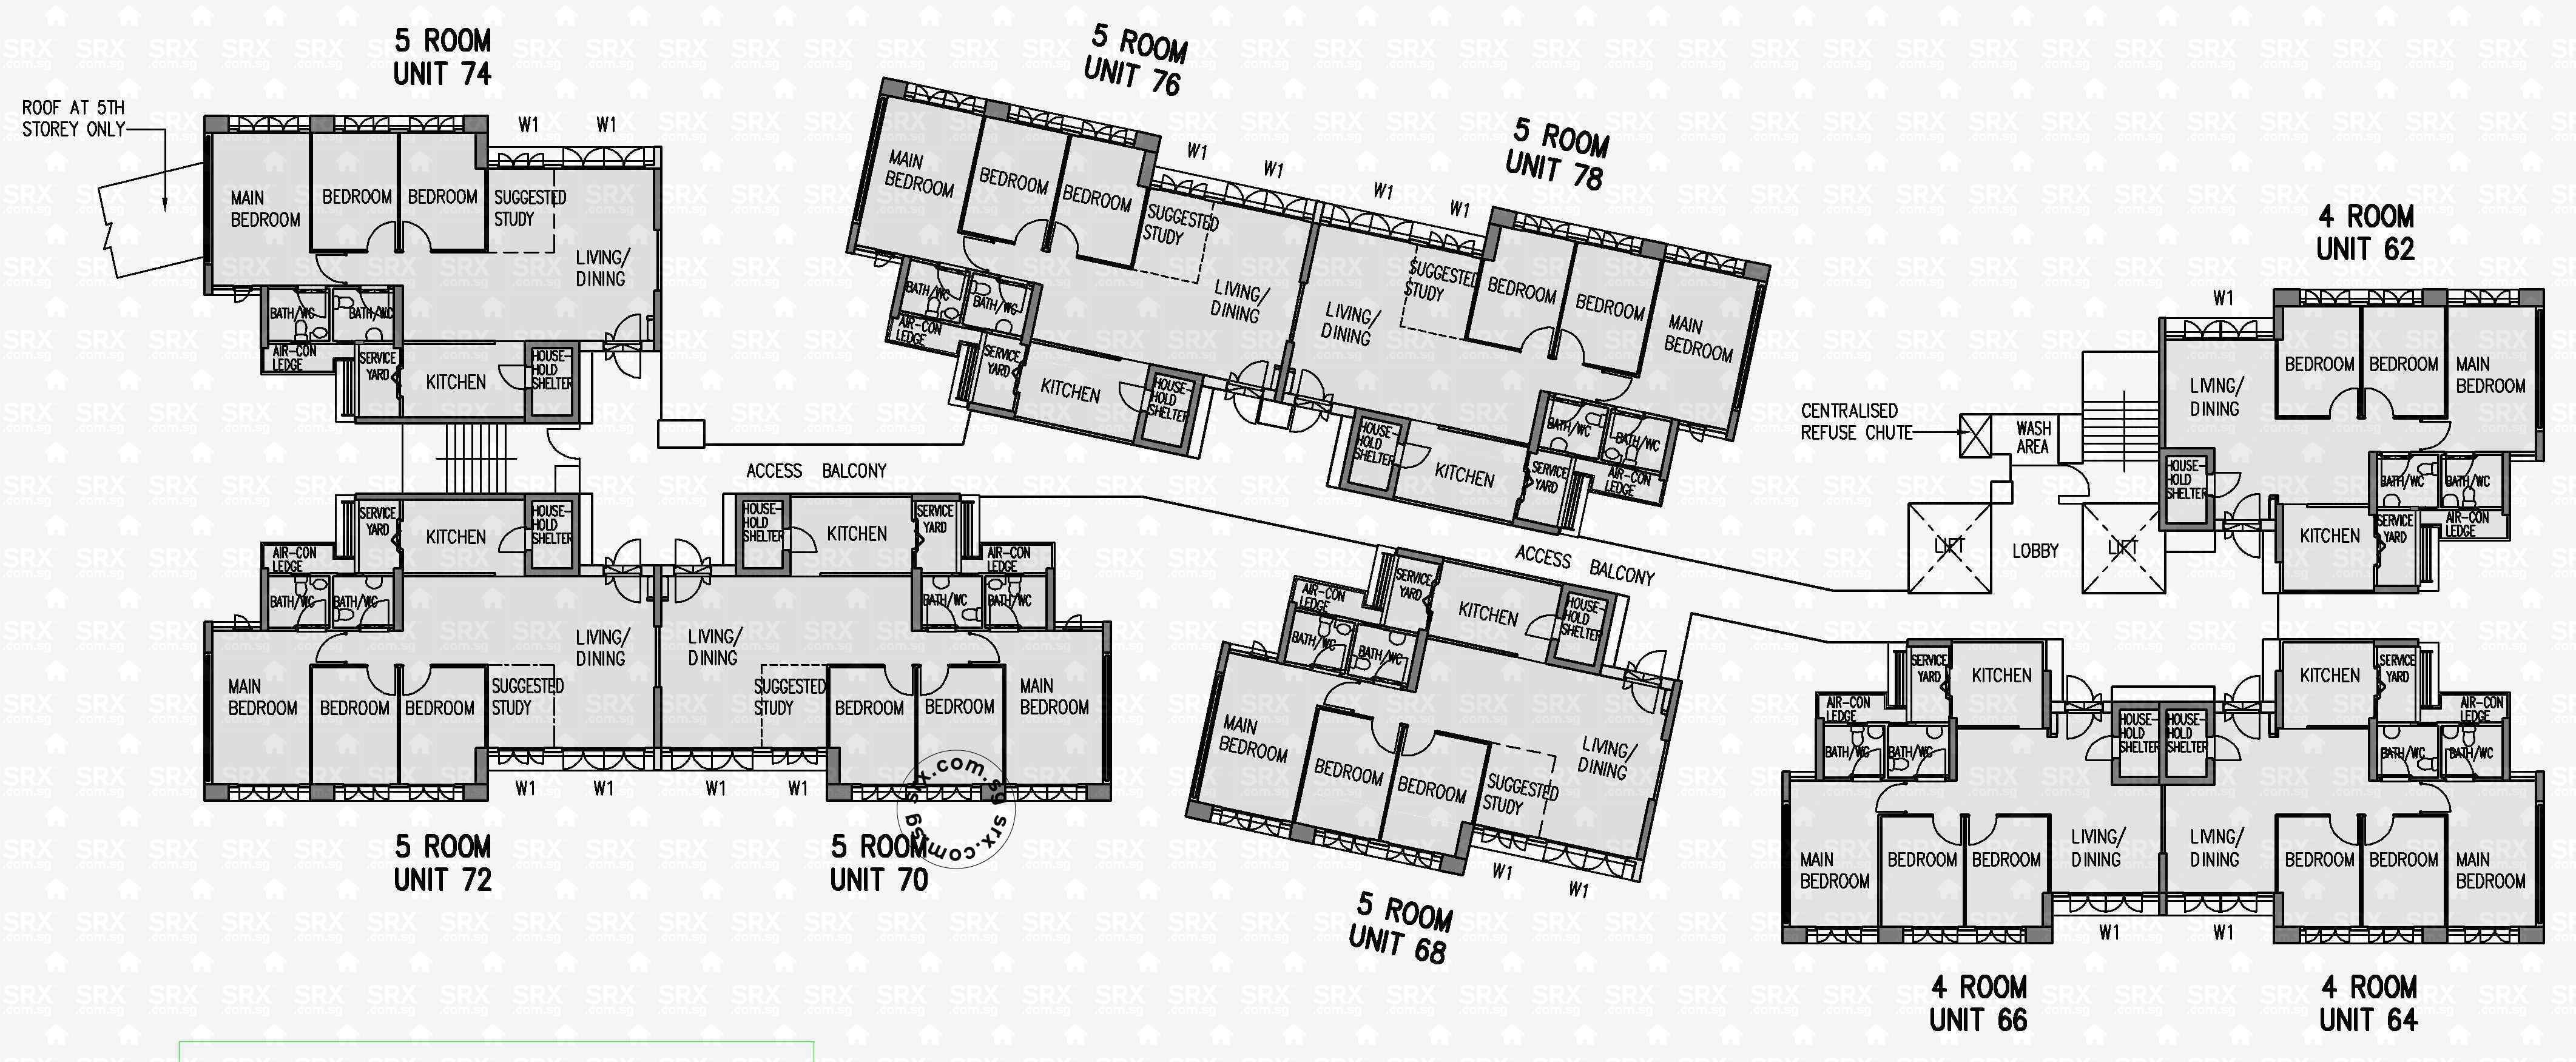 floor plans for keat hong close hdb details